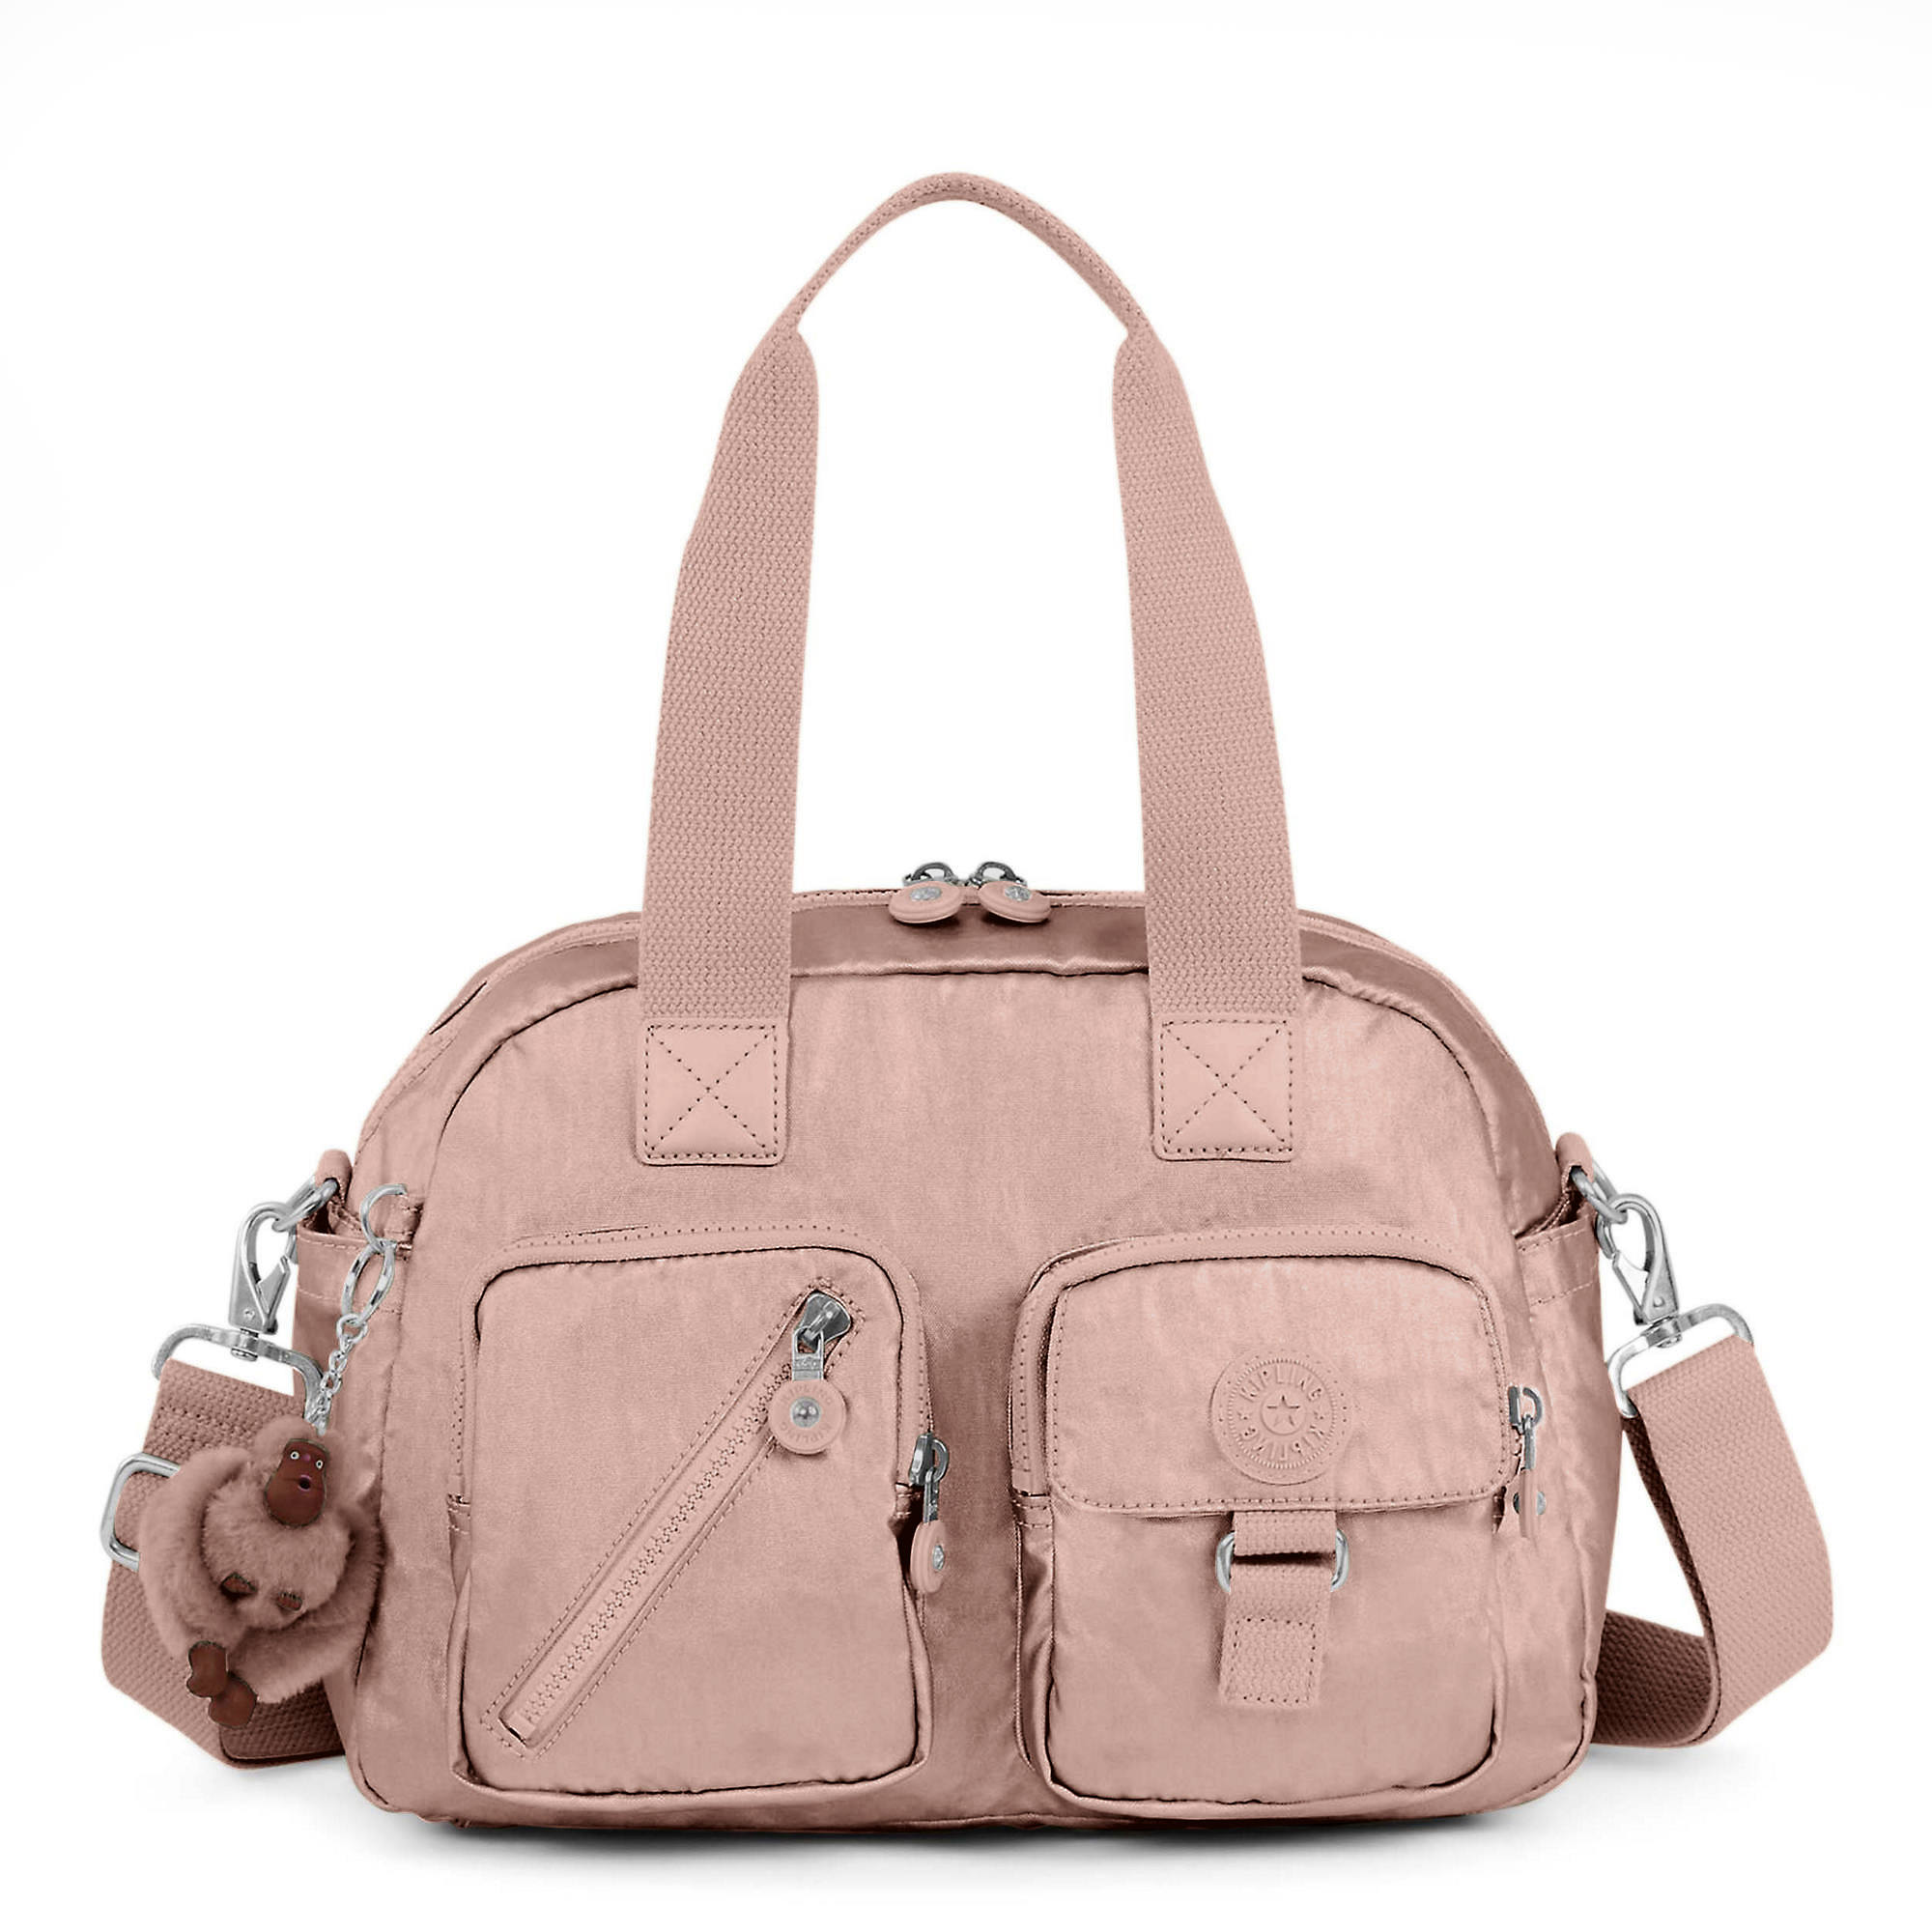 Defea Metallic Handbag Rose Gold Large